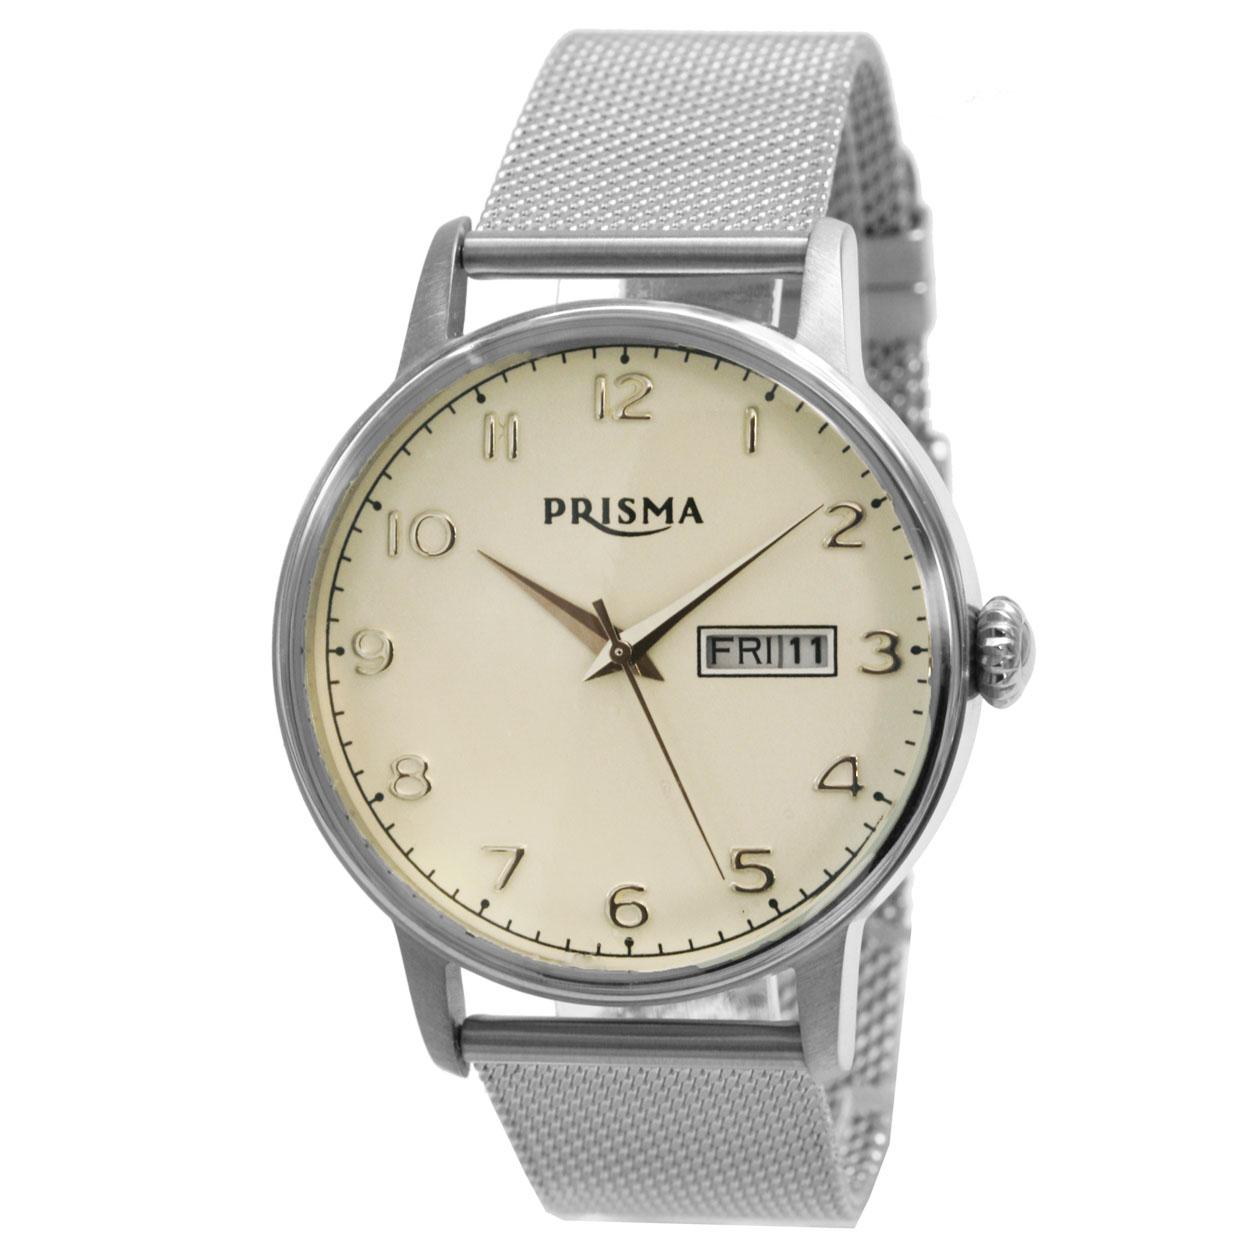 Prisma Herenhorloge P.2799A Lederen band Zilver